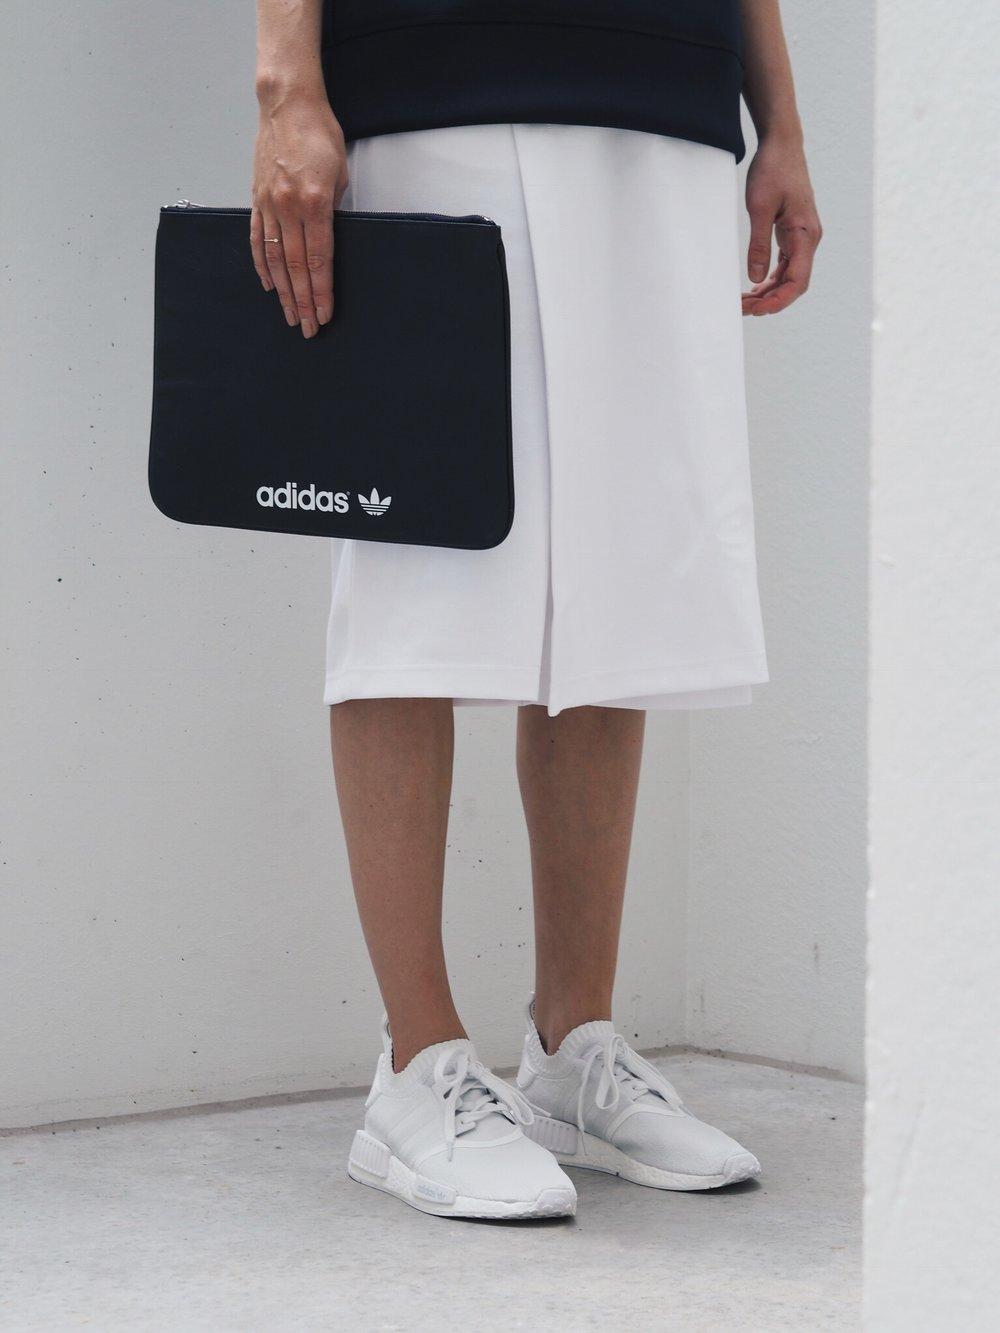 Adidas_NanaHagel2.JPG